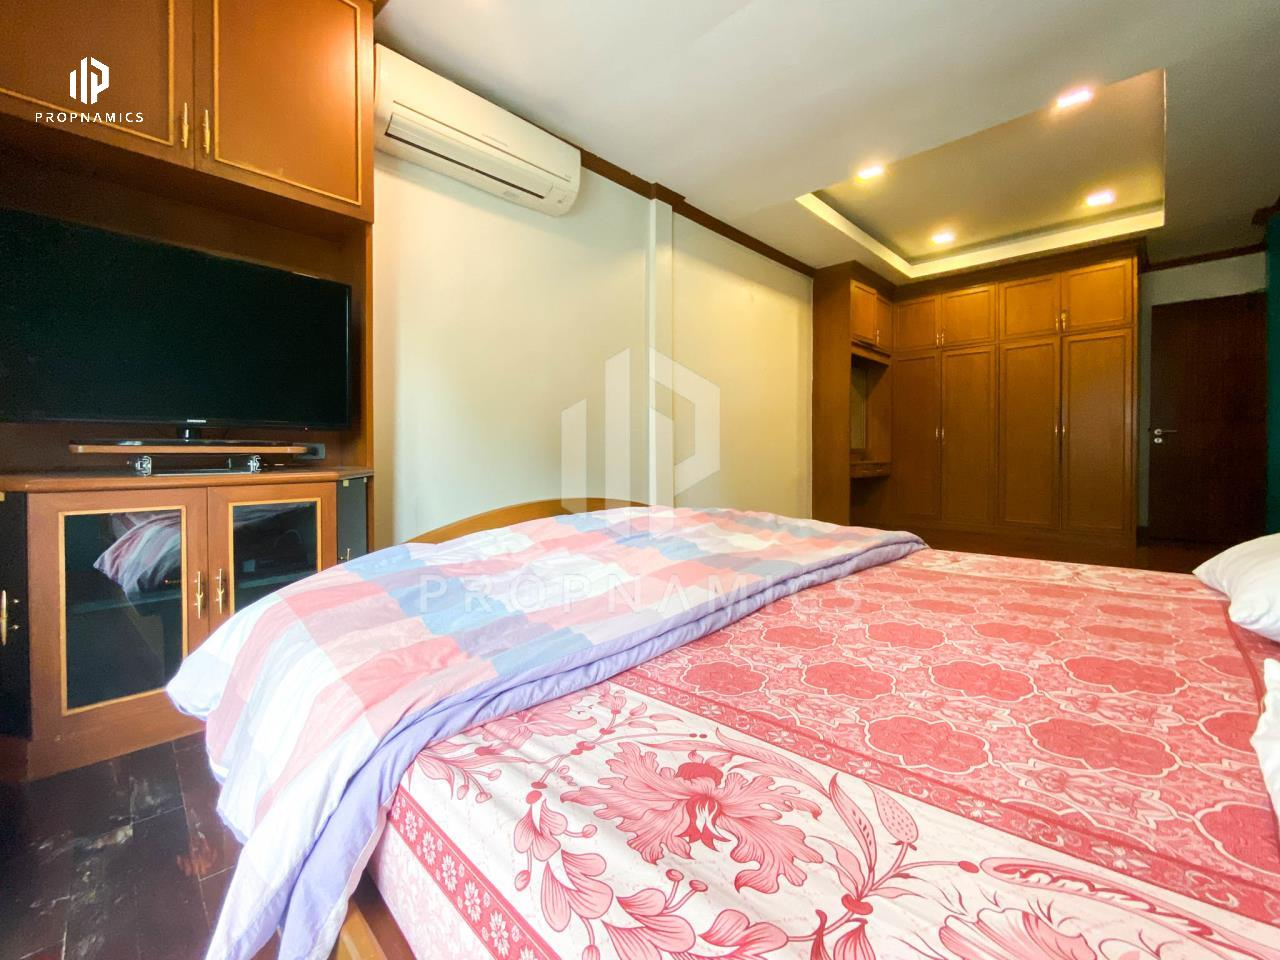 Propnamics Co., Ltd Agency's FOR RENT: SINGLE HOUSE IN SUKHUMVIT 26 16